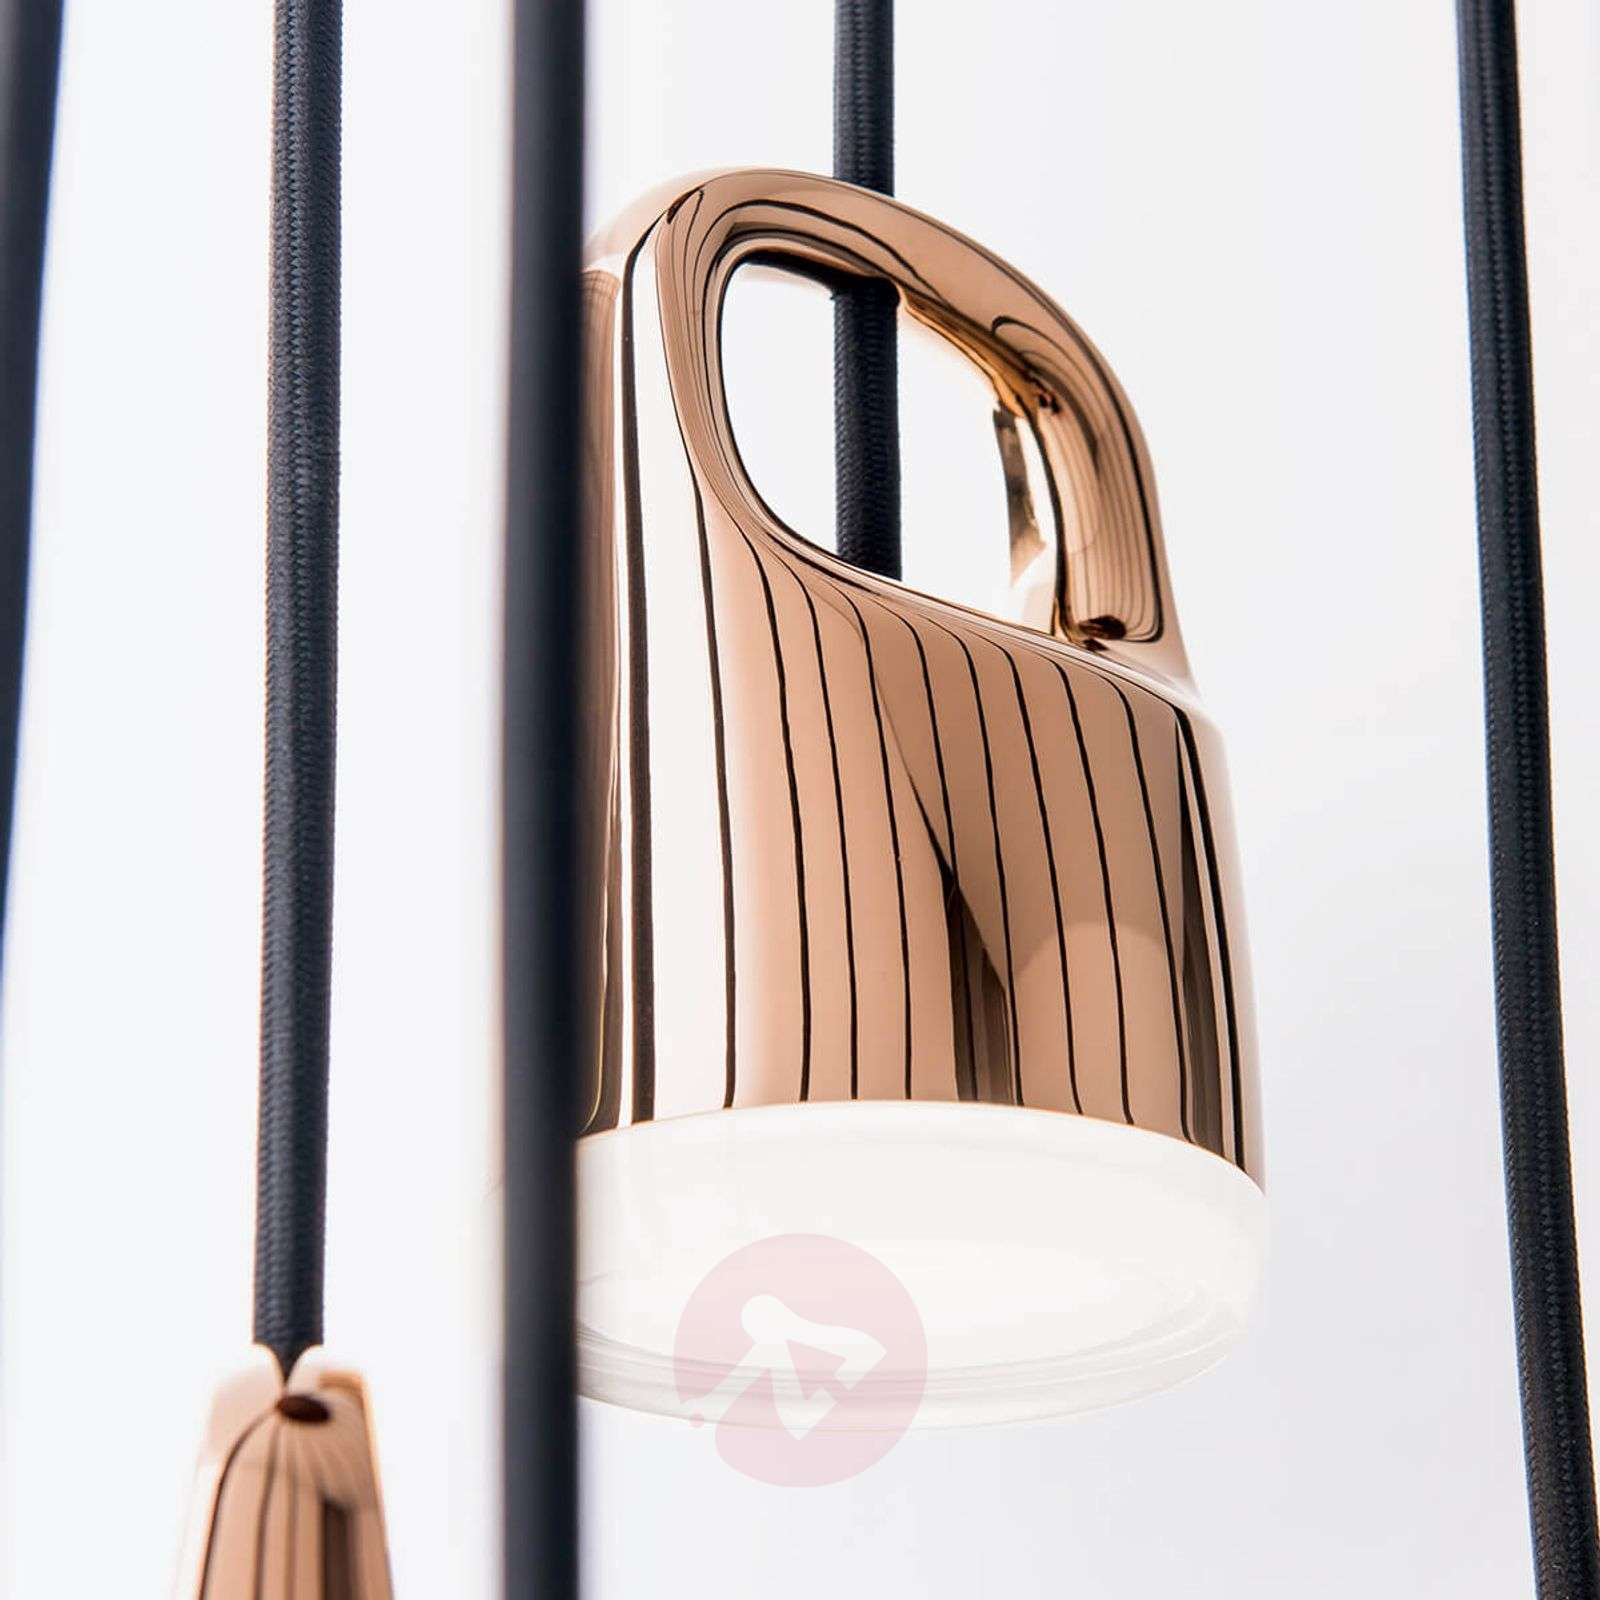 Spiral-shaped LED hanging light Tinus-7255310-01